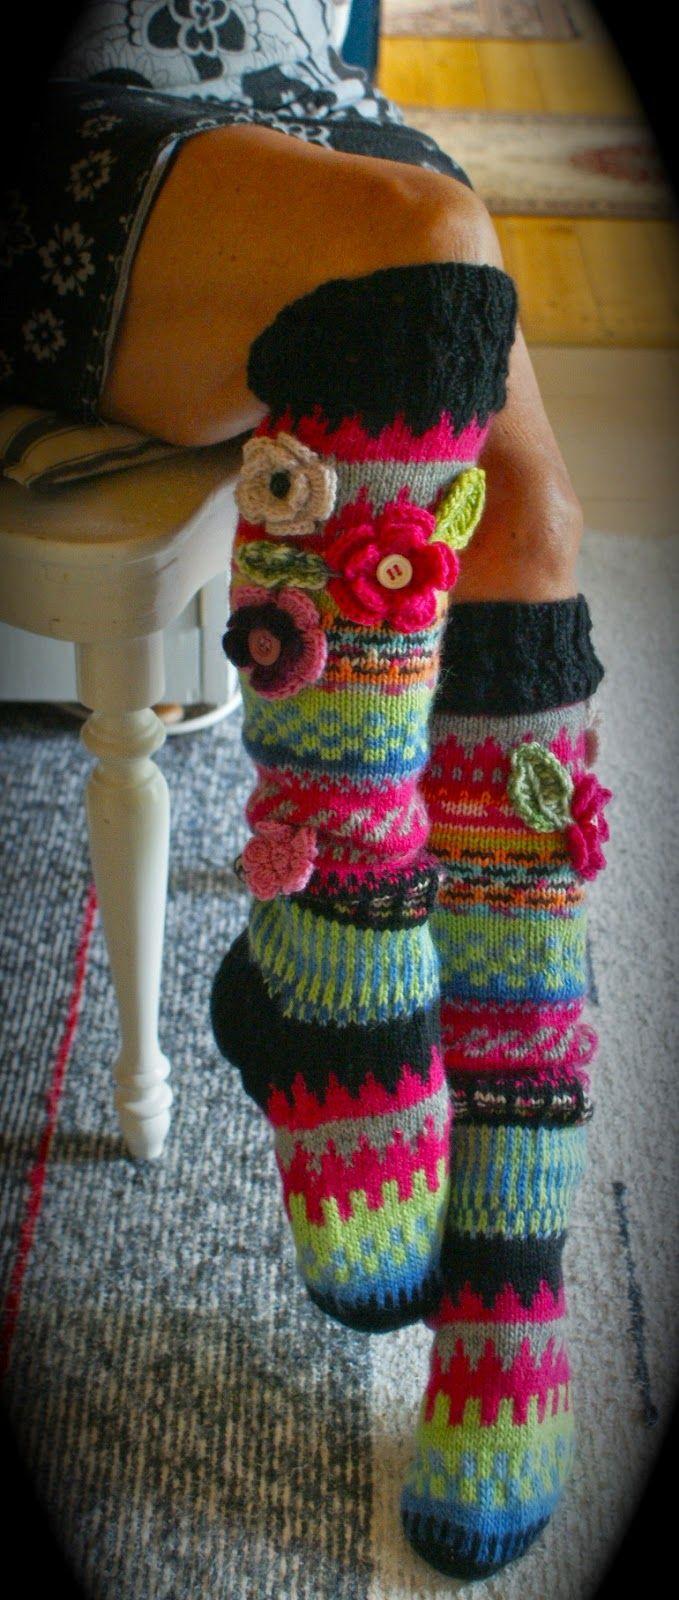 Knitting Patterns For Funky Socks : 428 best images about Funky Socks on Pinterest Fair ...